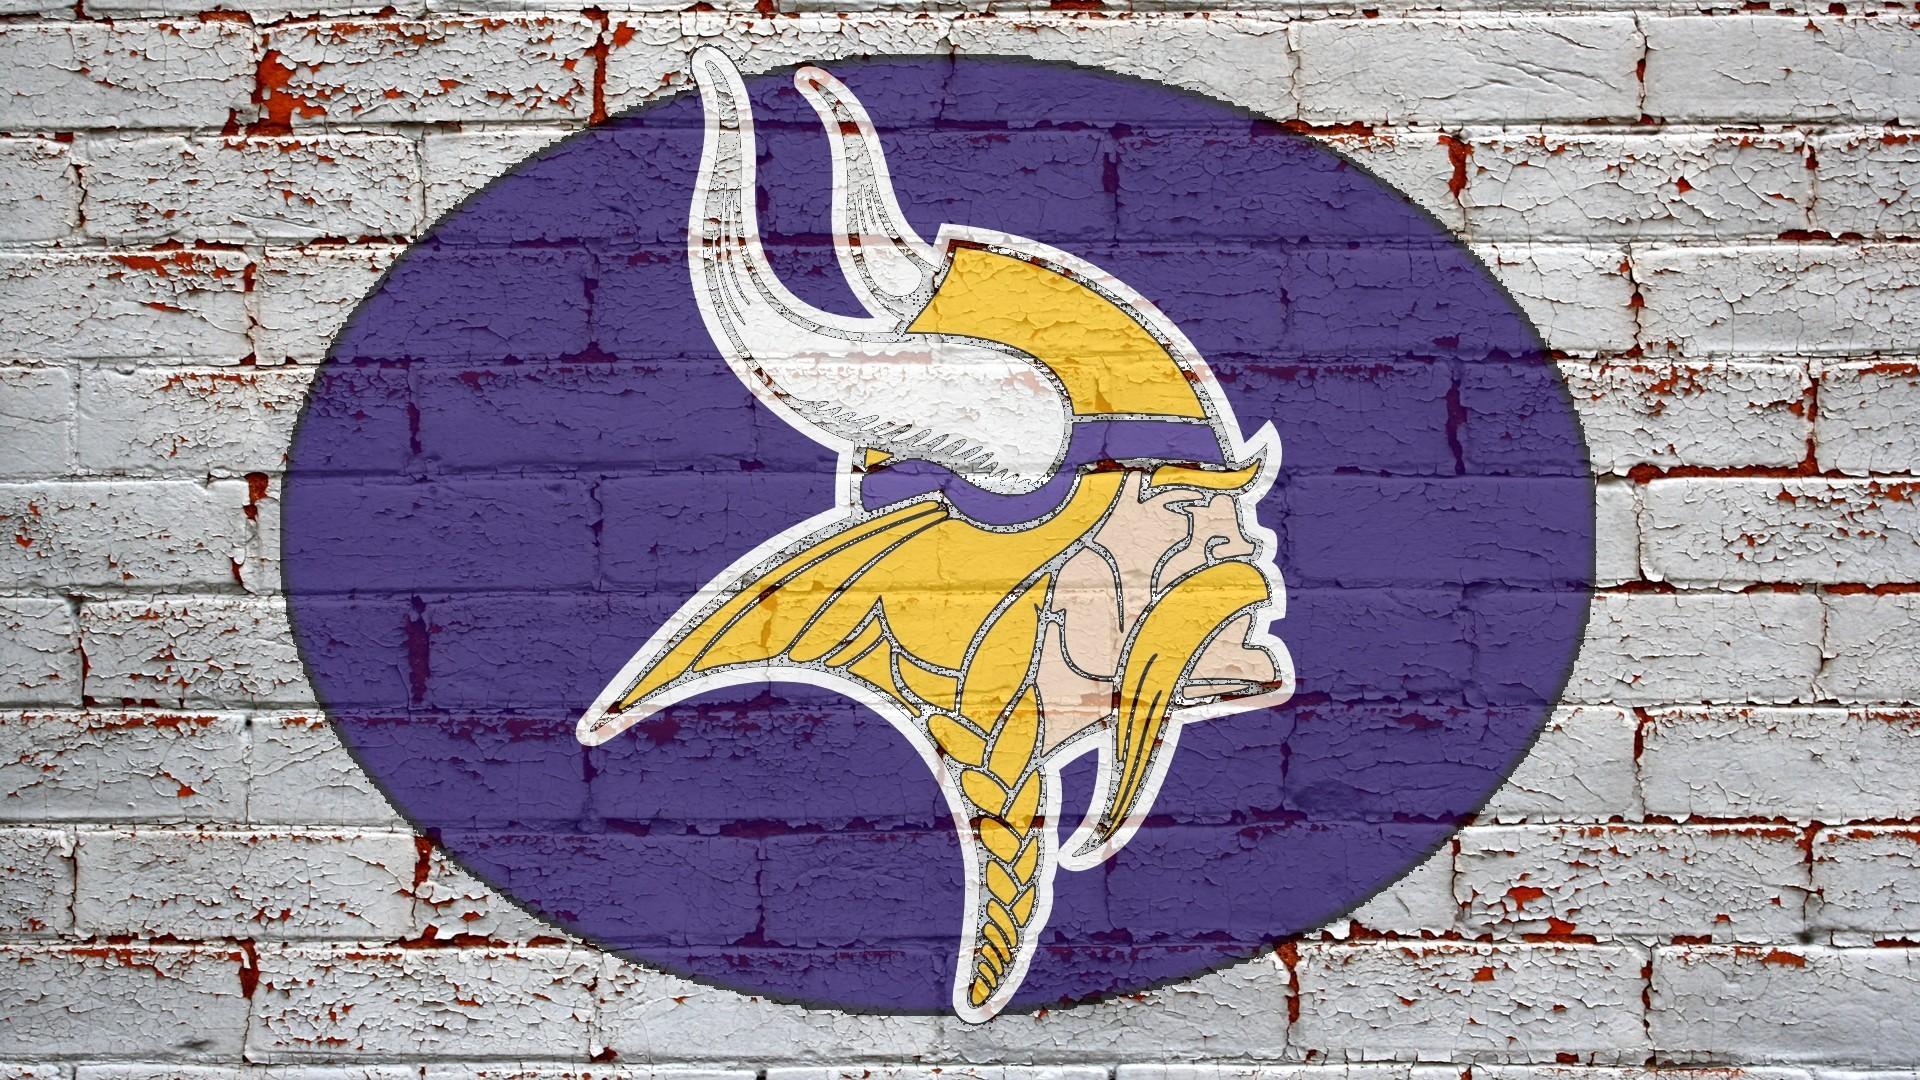 … Football Nfl Minnesota Vikings Adrian Peterson Hd Background Wallpaper  …